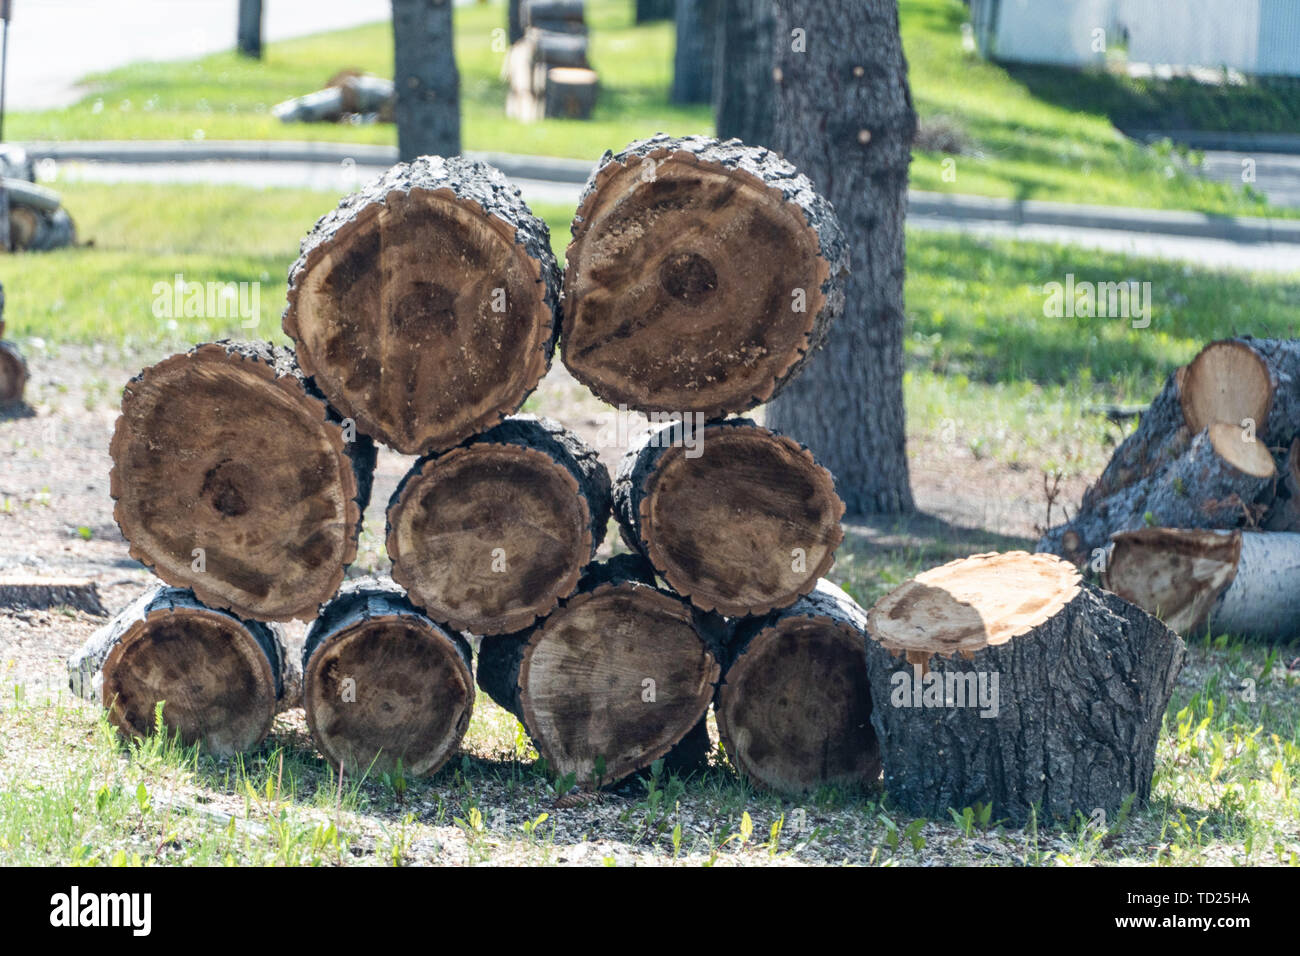 stacks of cut tree